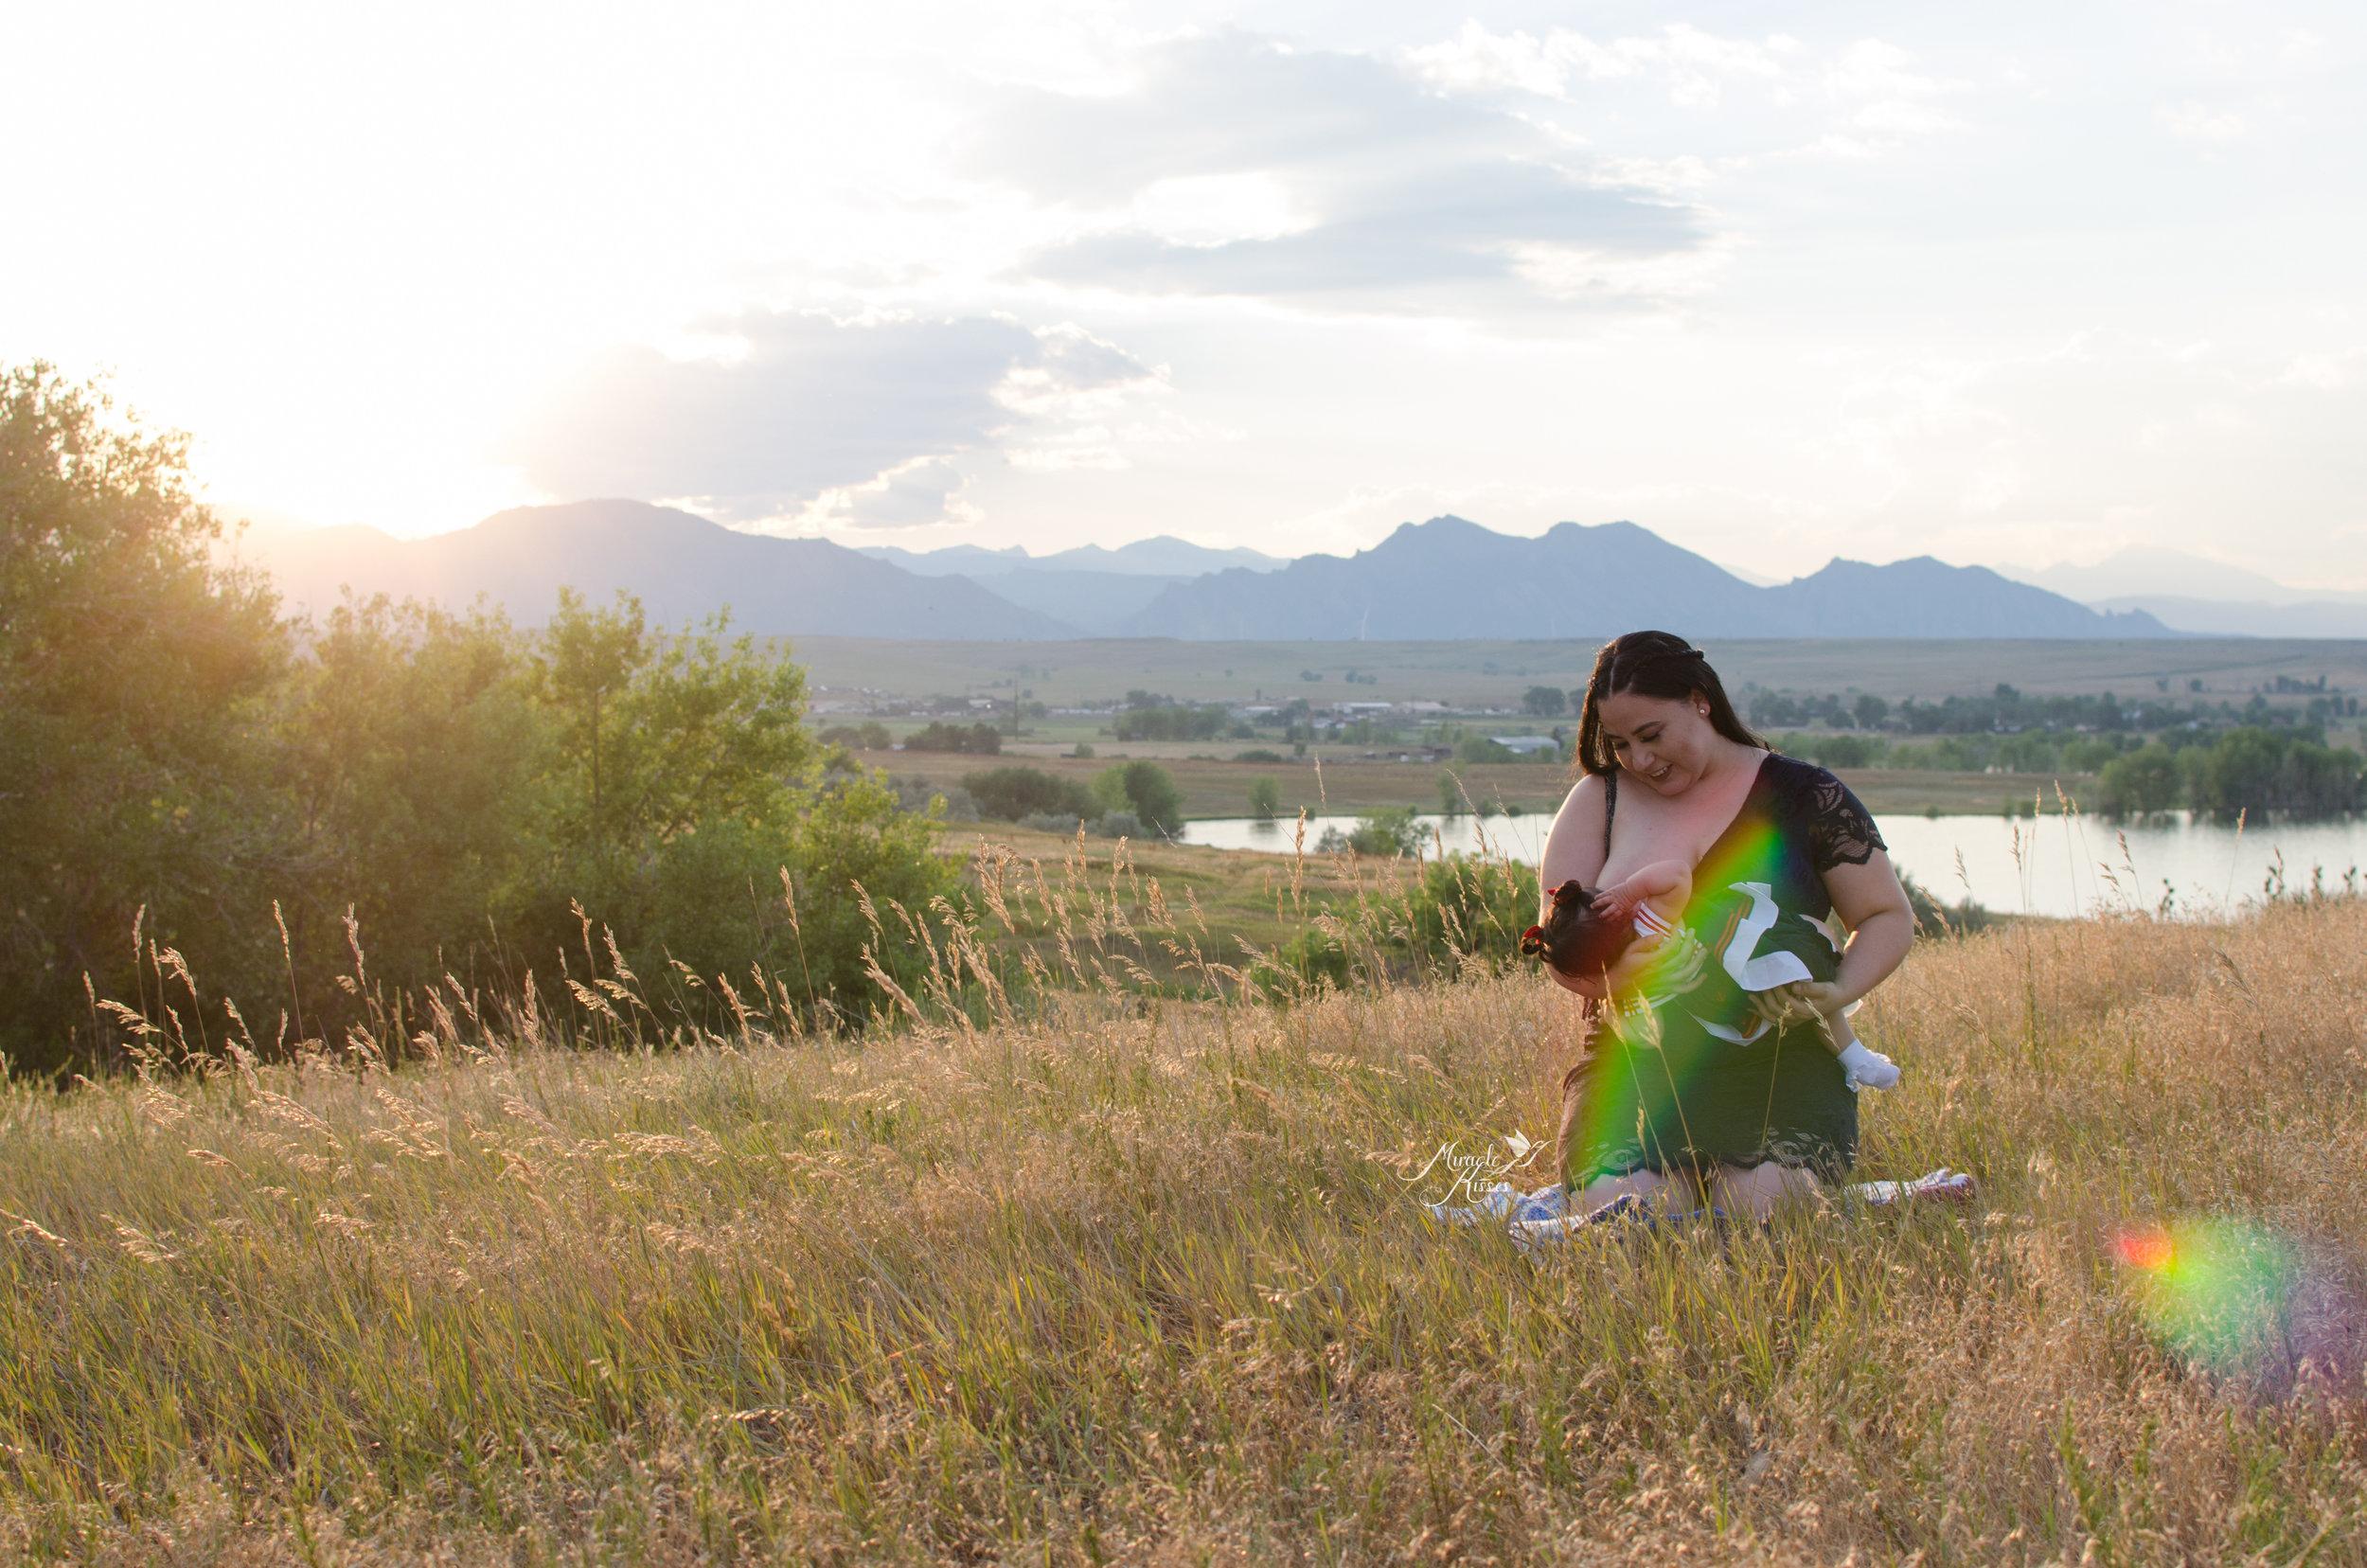 Solar flare tutu, normalize breastfeeding, world breastfeeding week